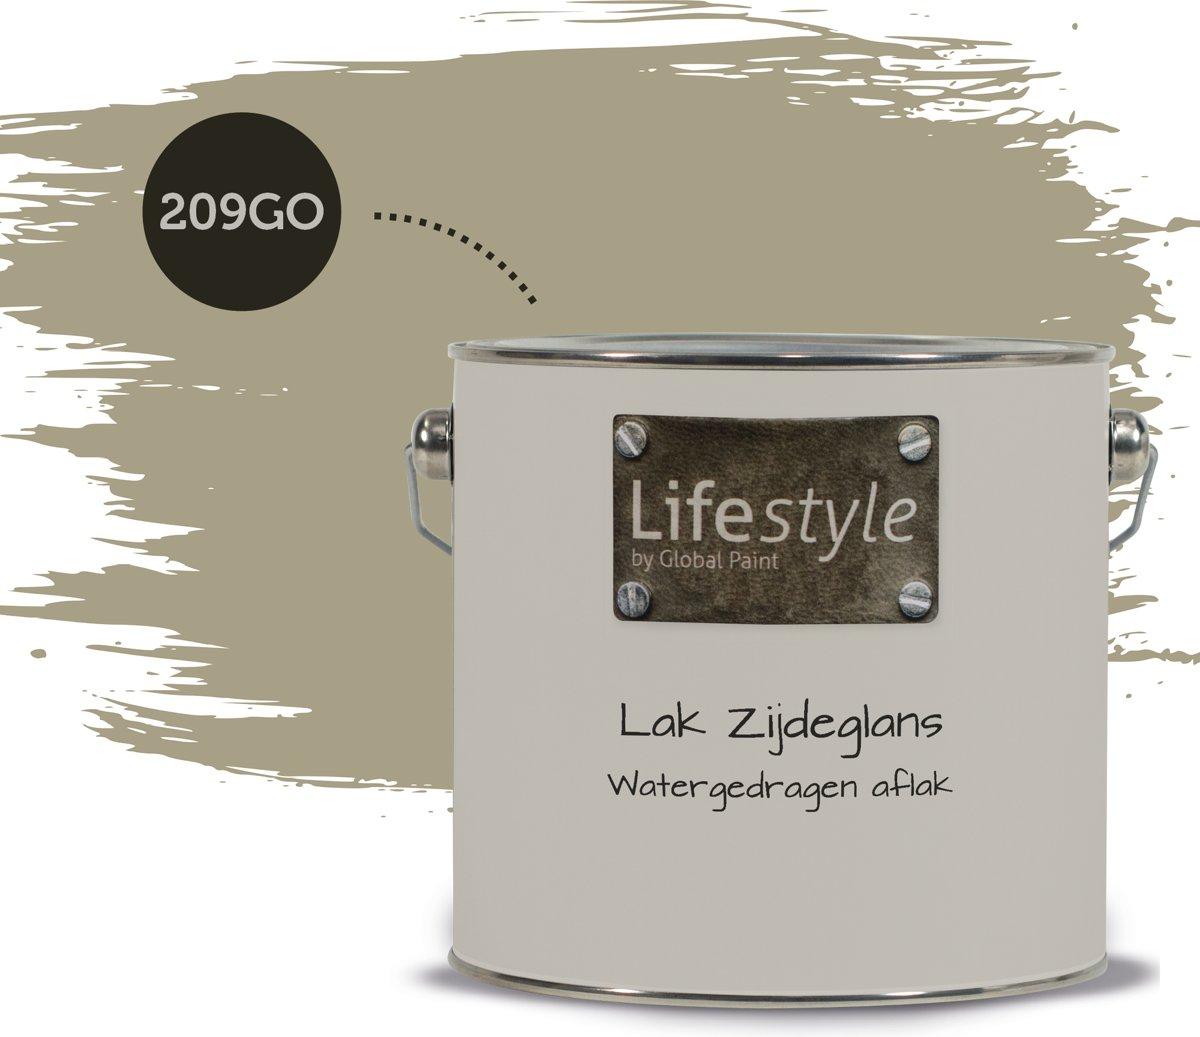 Lifestyle Lak Zijdeglans - 209GO - 2.5 liter kopen